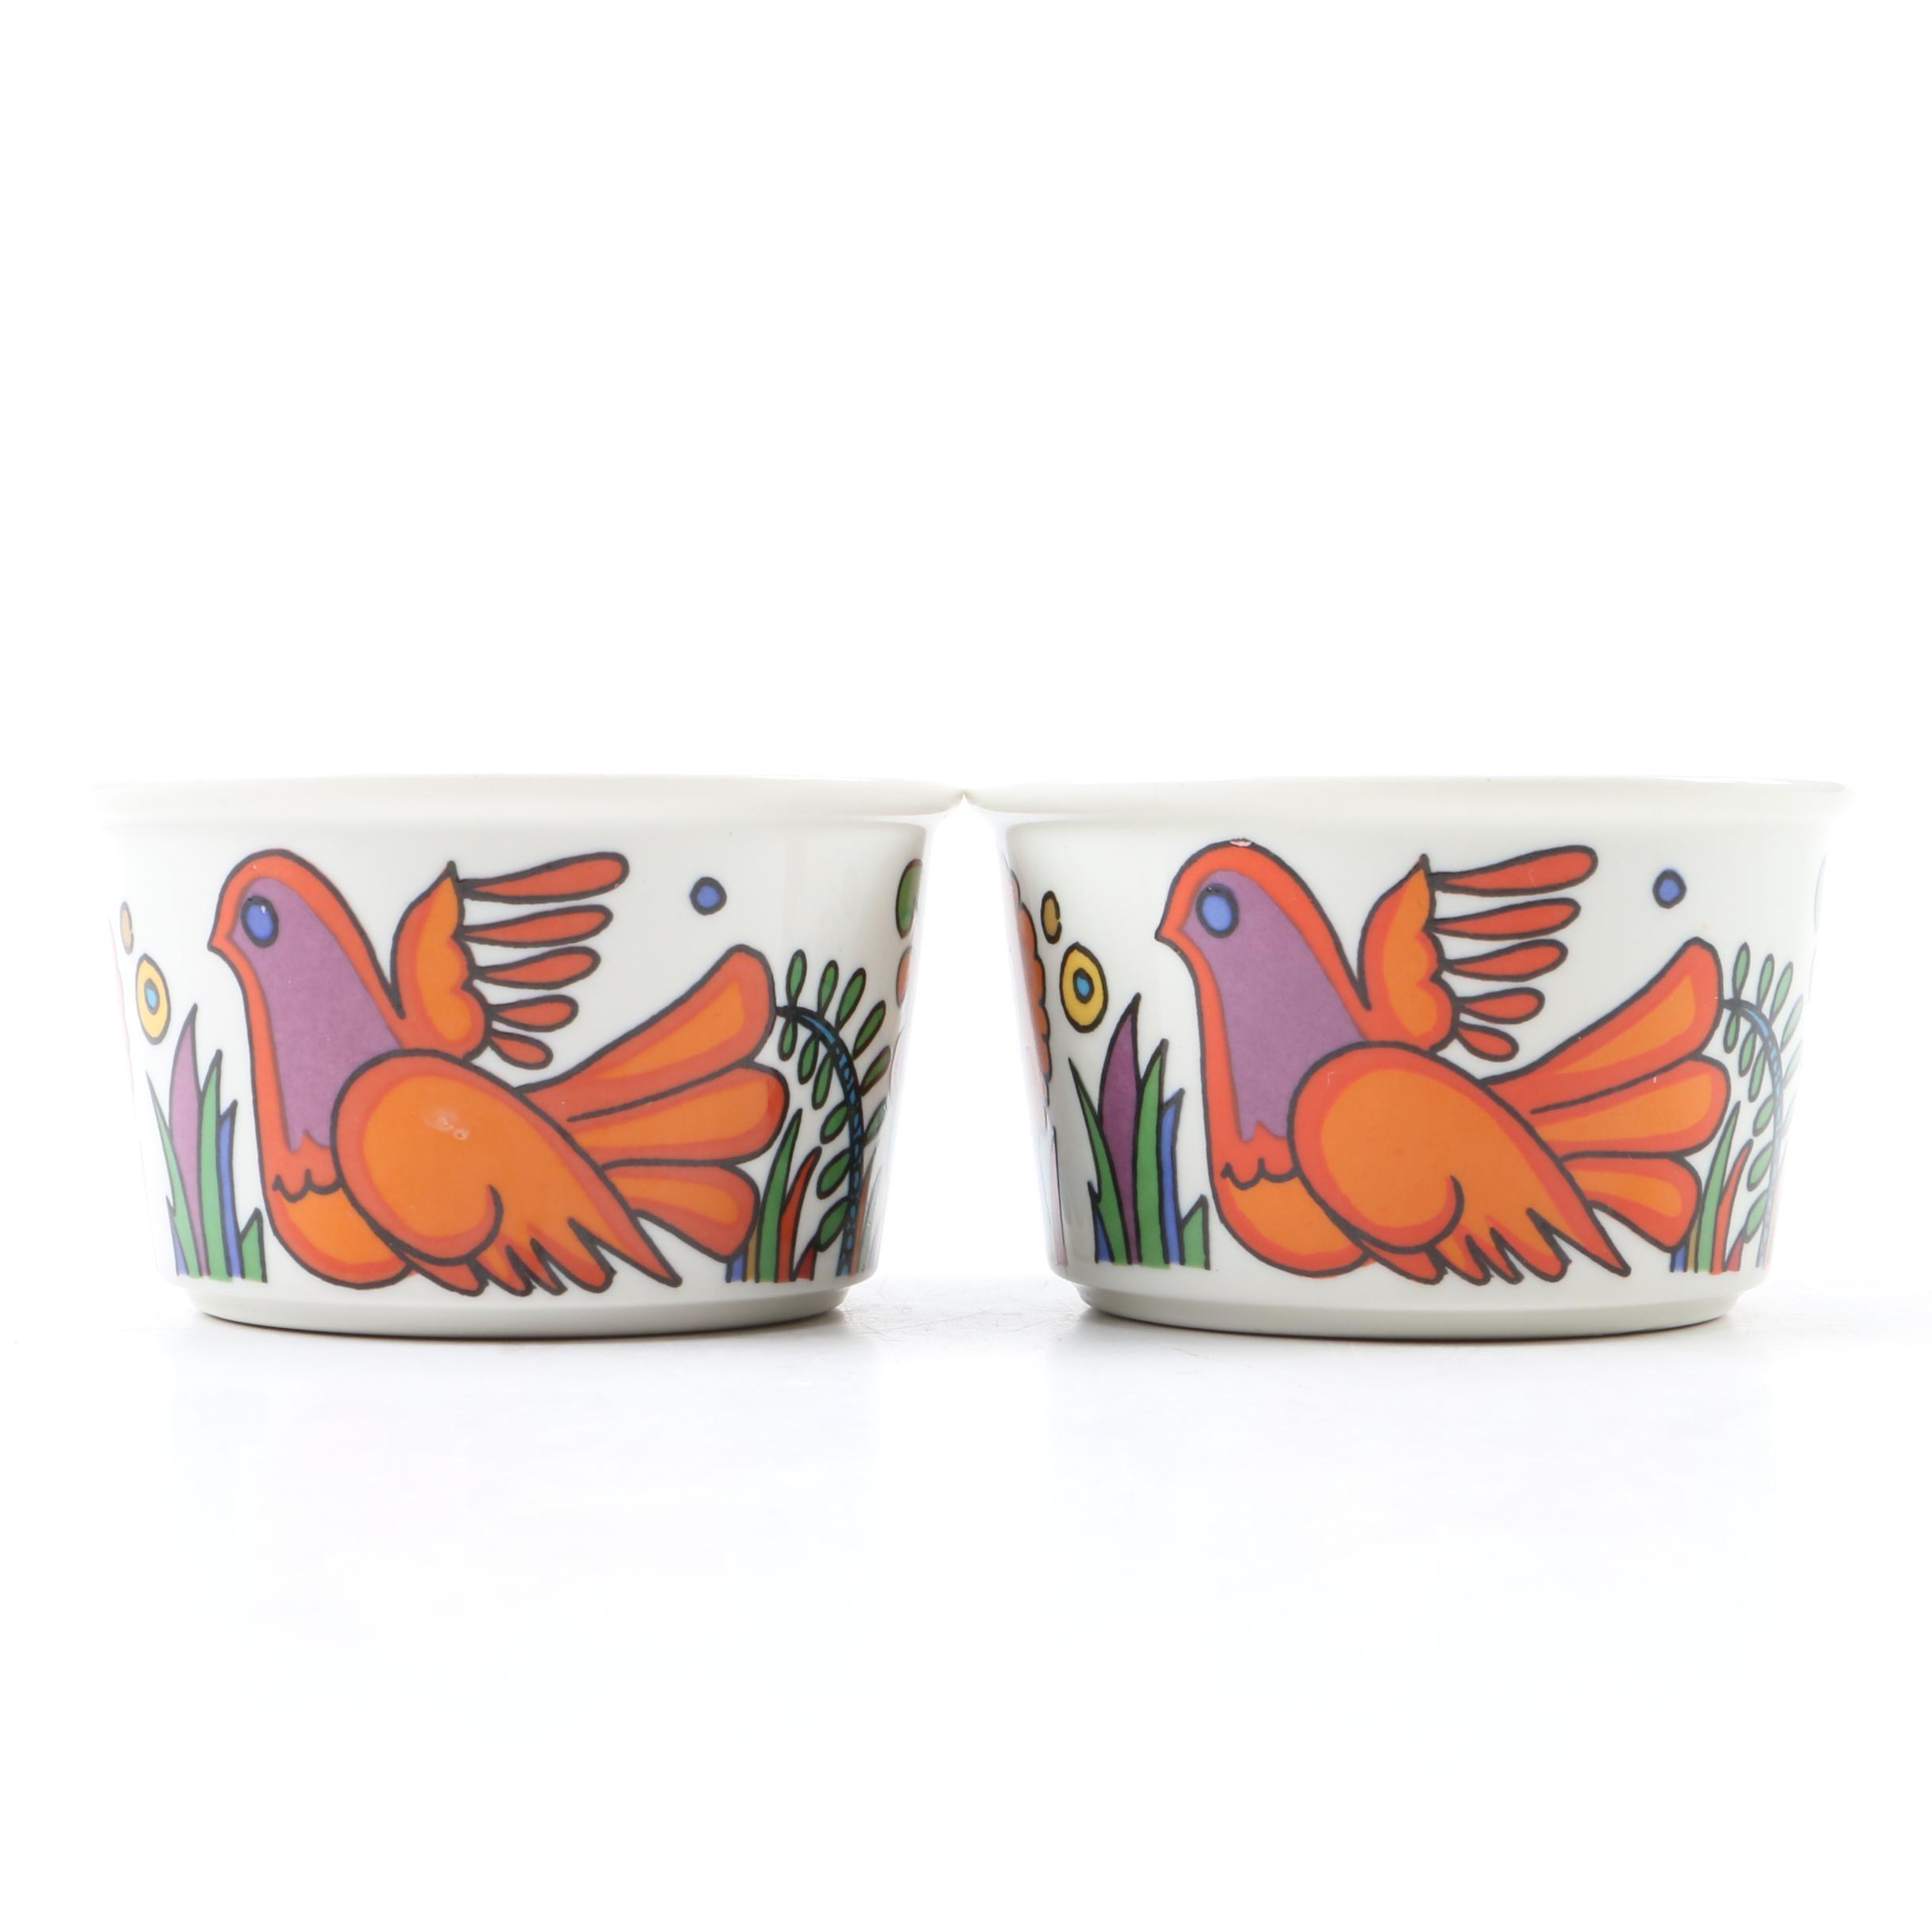 "Vintage Villeroy & Boch ""Acapulco"" Porcelain Ramekins"